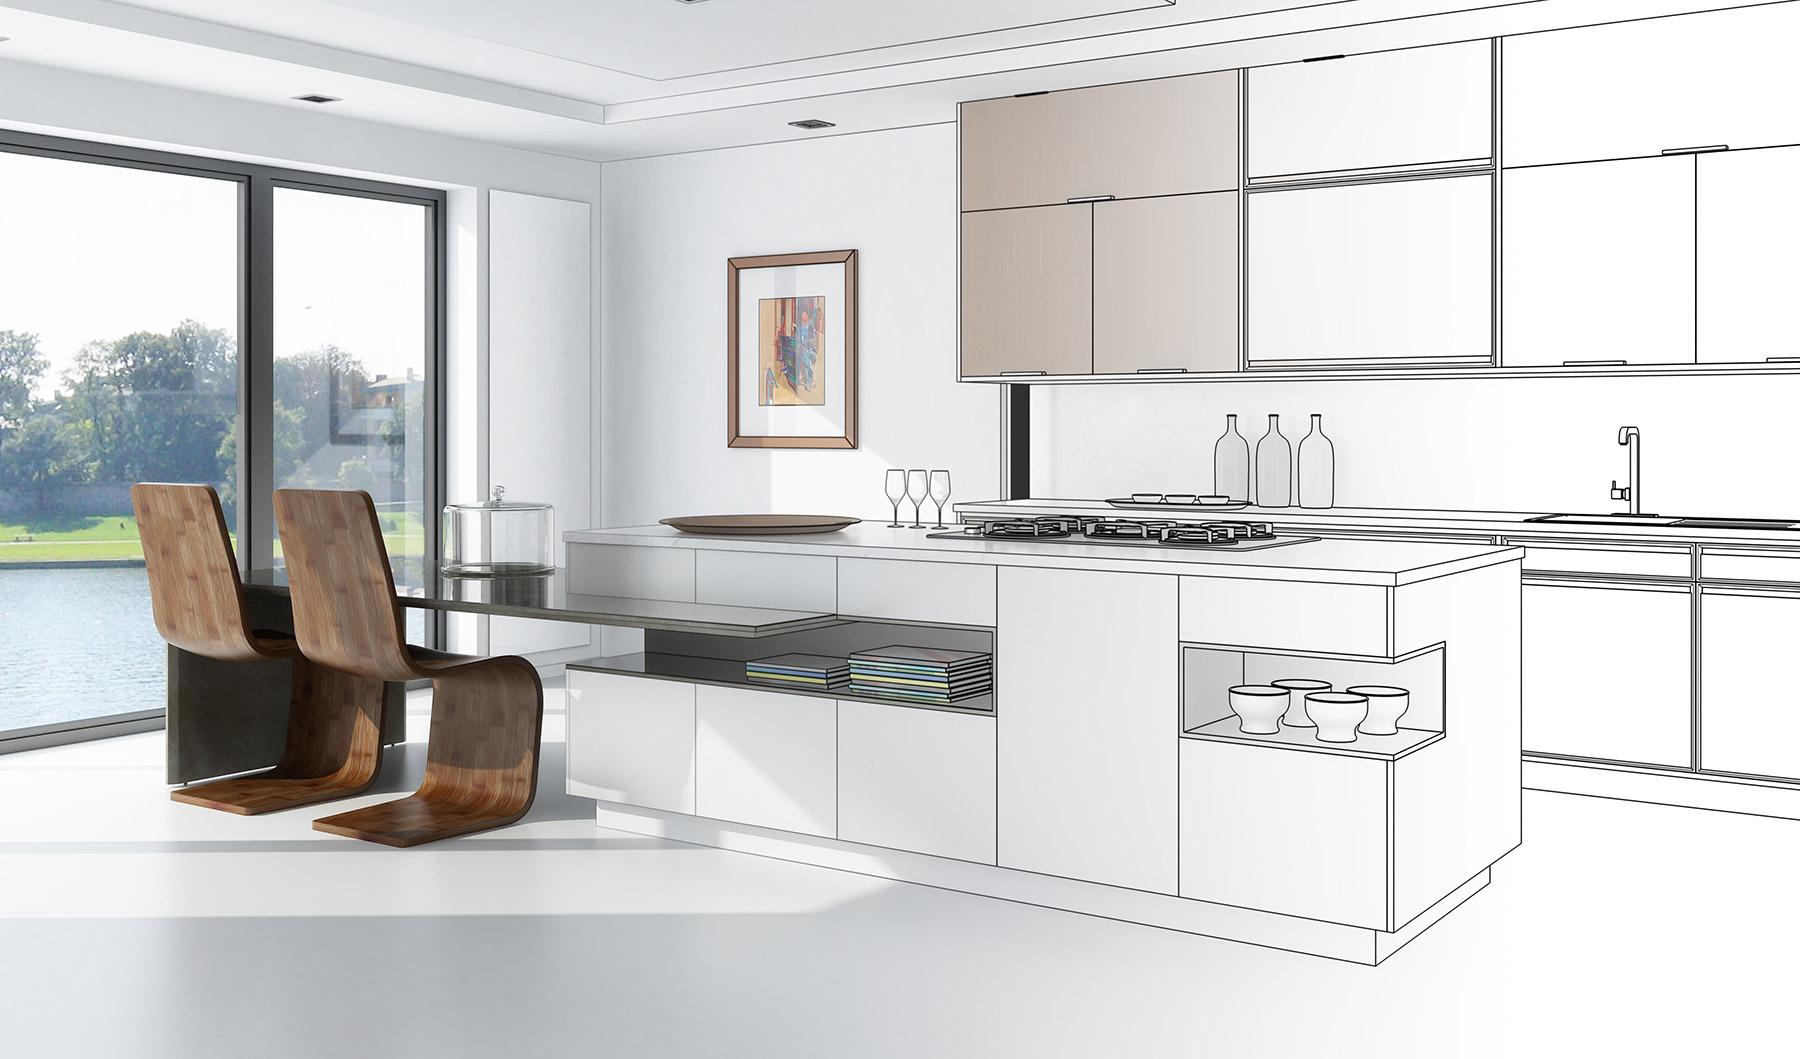 emplois carri res armodec. Black Bedroom Furniture Sets. Home Design Ideas